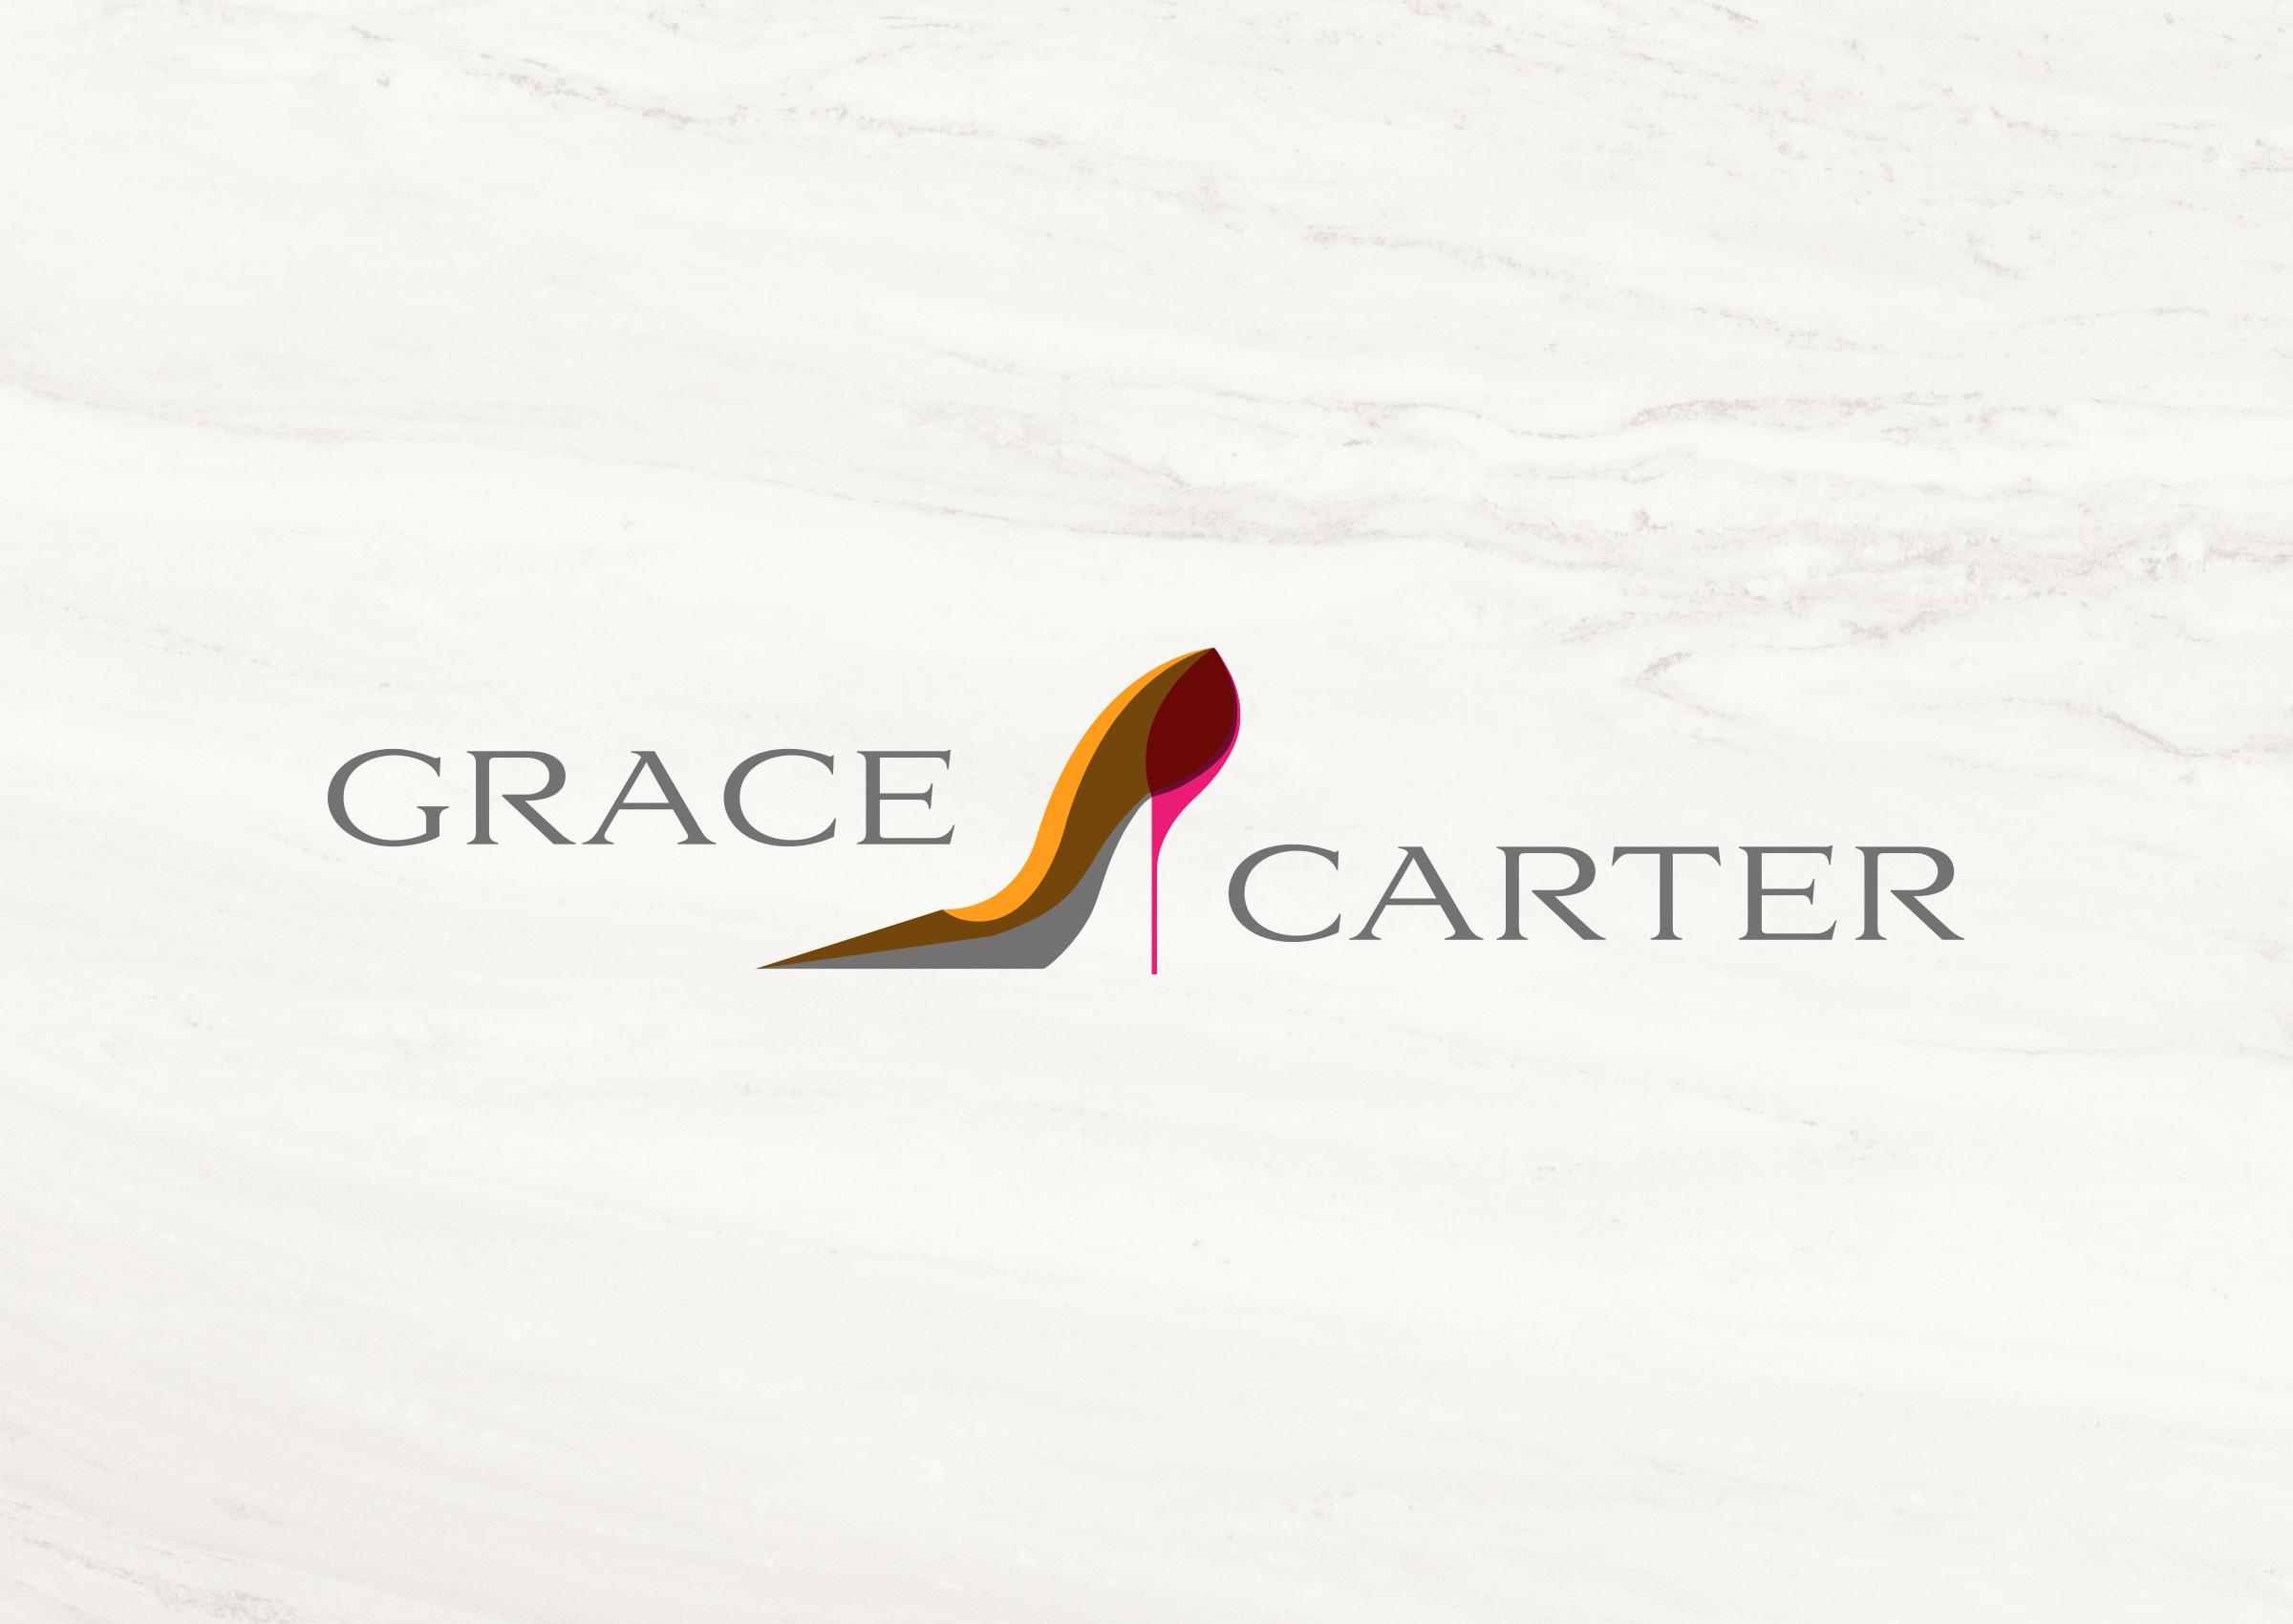 Grace-Carter-Logo-X.jpg